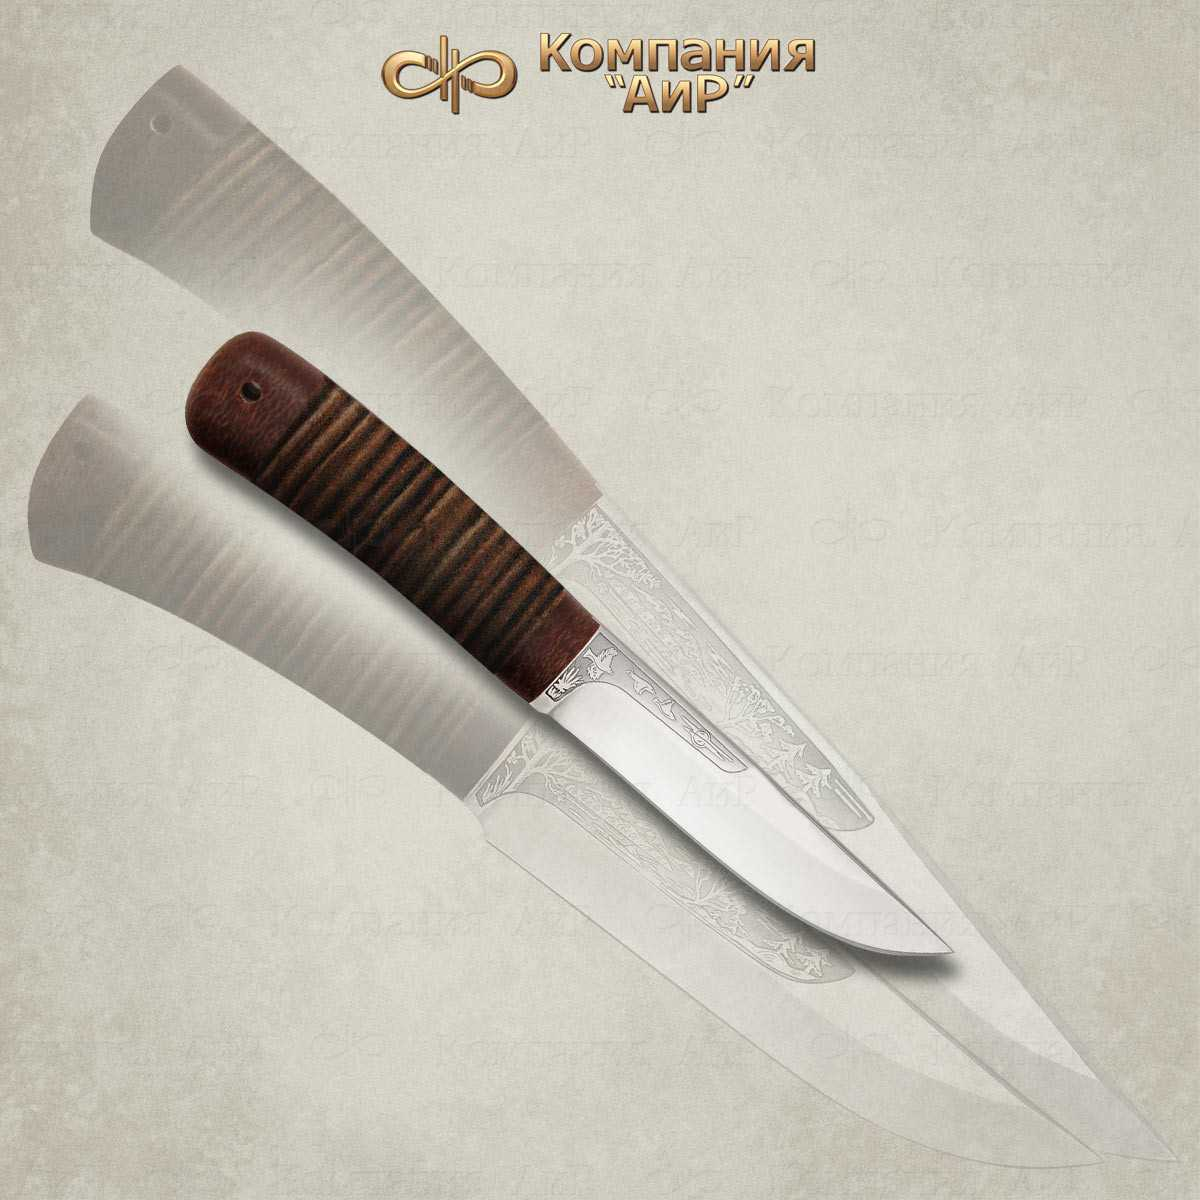 Фото - Нож Шашлычный малый, АиР, кожа, 100х13м